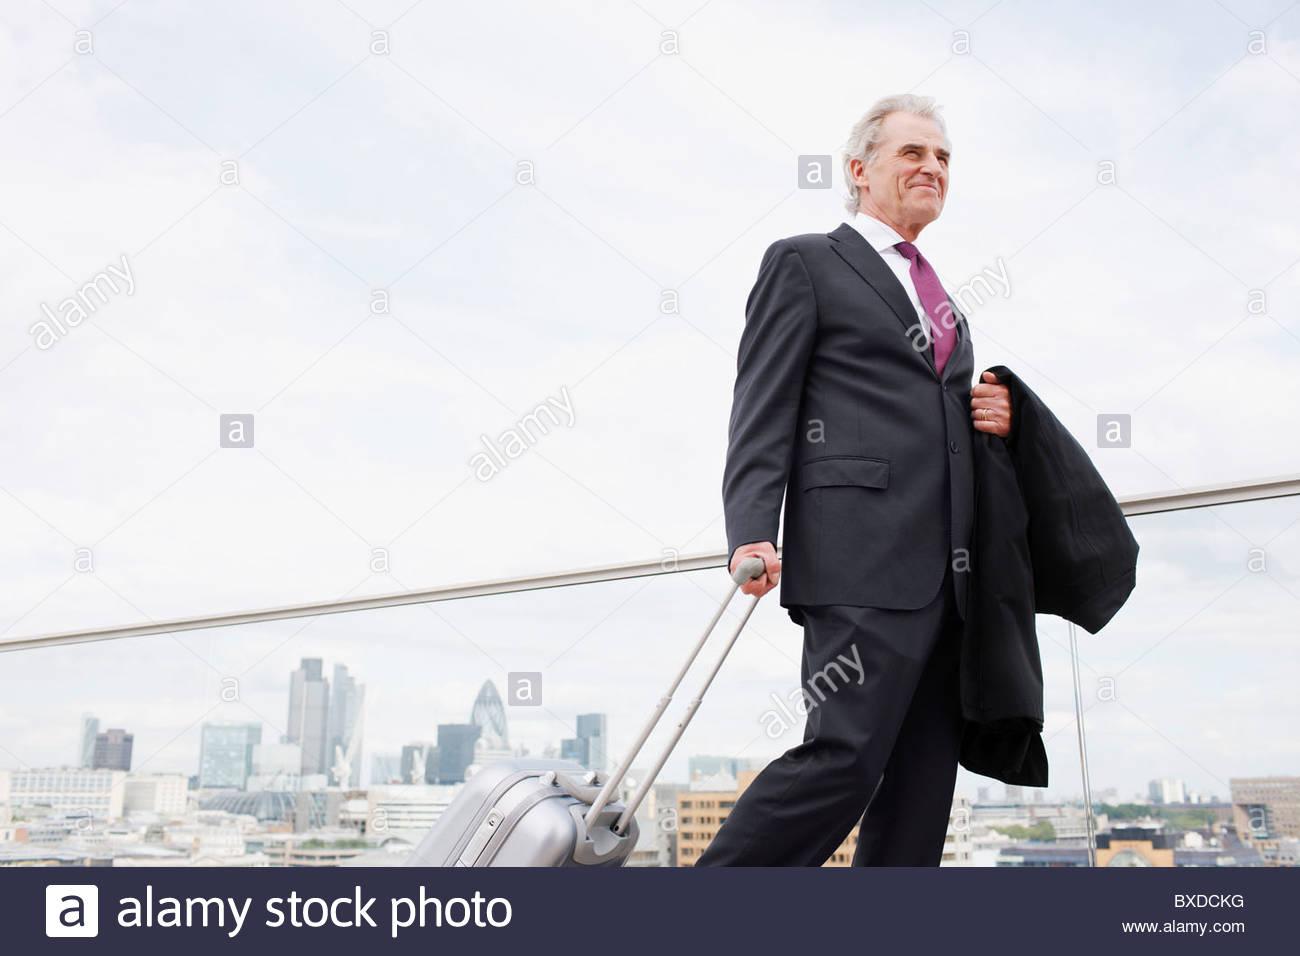 Businessman pulling luggage across urban balcony - Stock Image